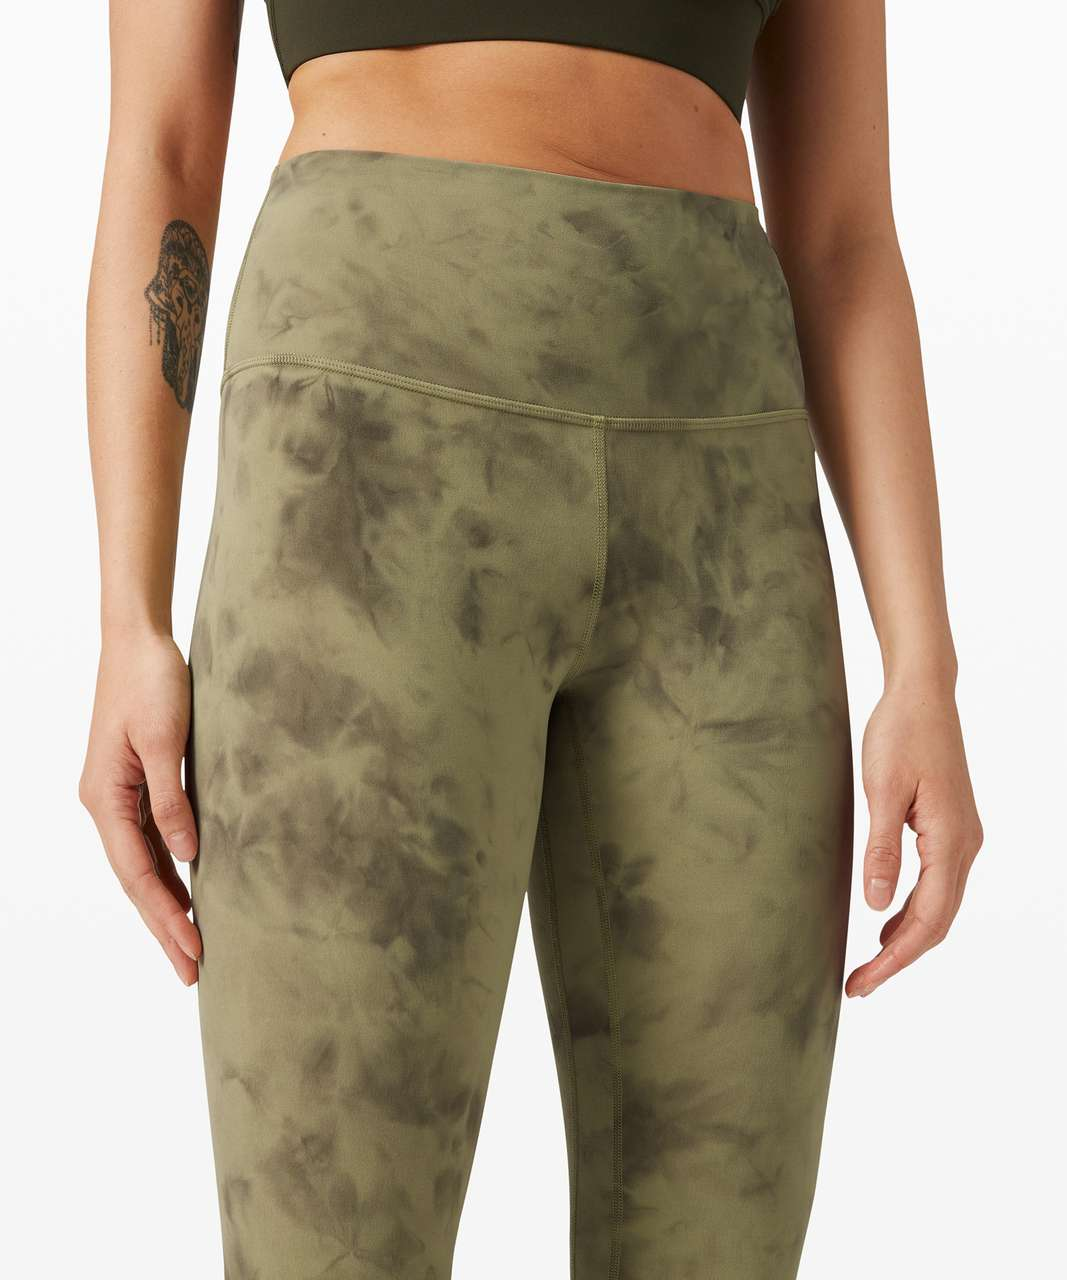 "Lululemon Align Pant 25"" *Diamond Dye - Diamond Dye Vista Green Medium Olive"